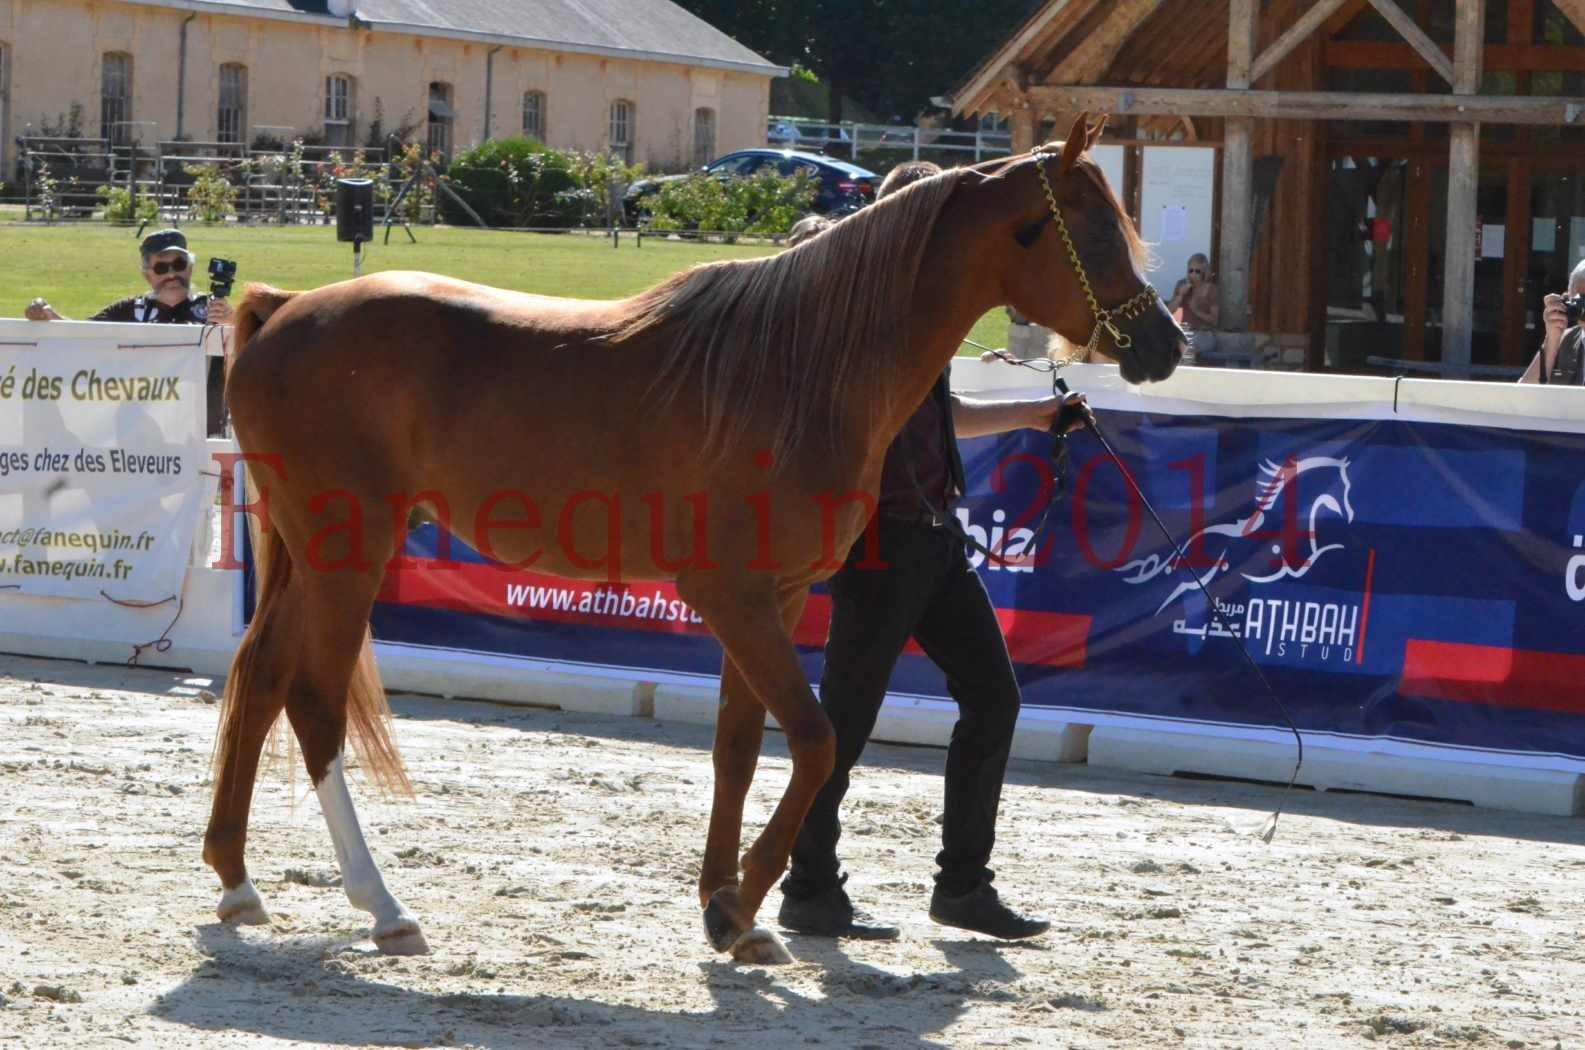 Championnat de FRANCE 2014 - Amateurs - SELECTO IBN SAMAWI - 019